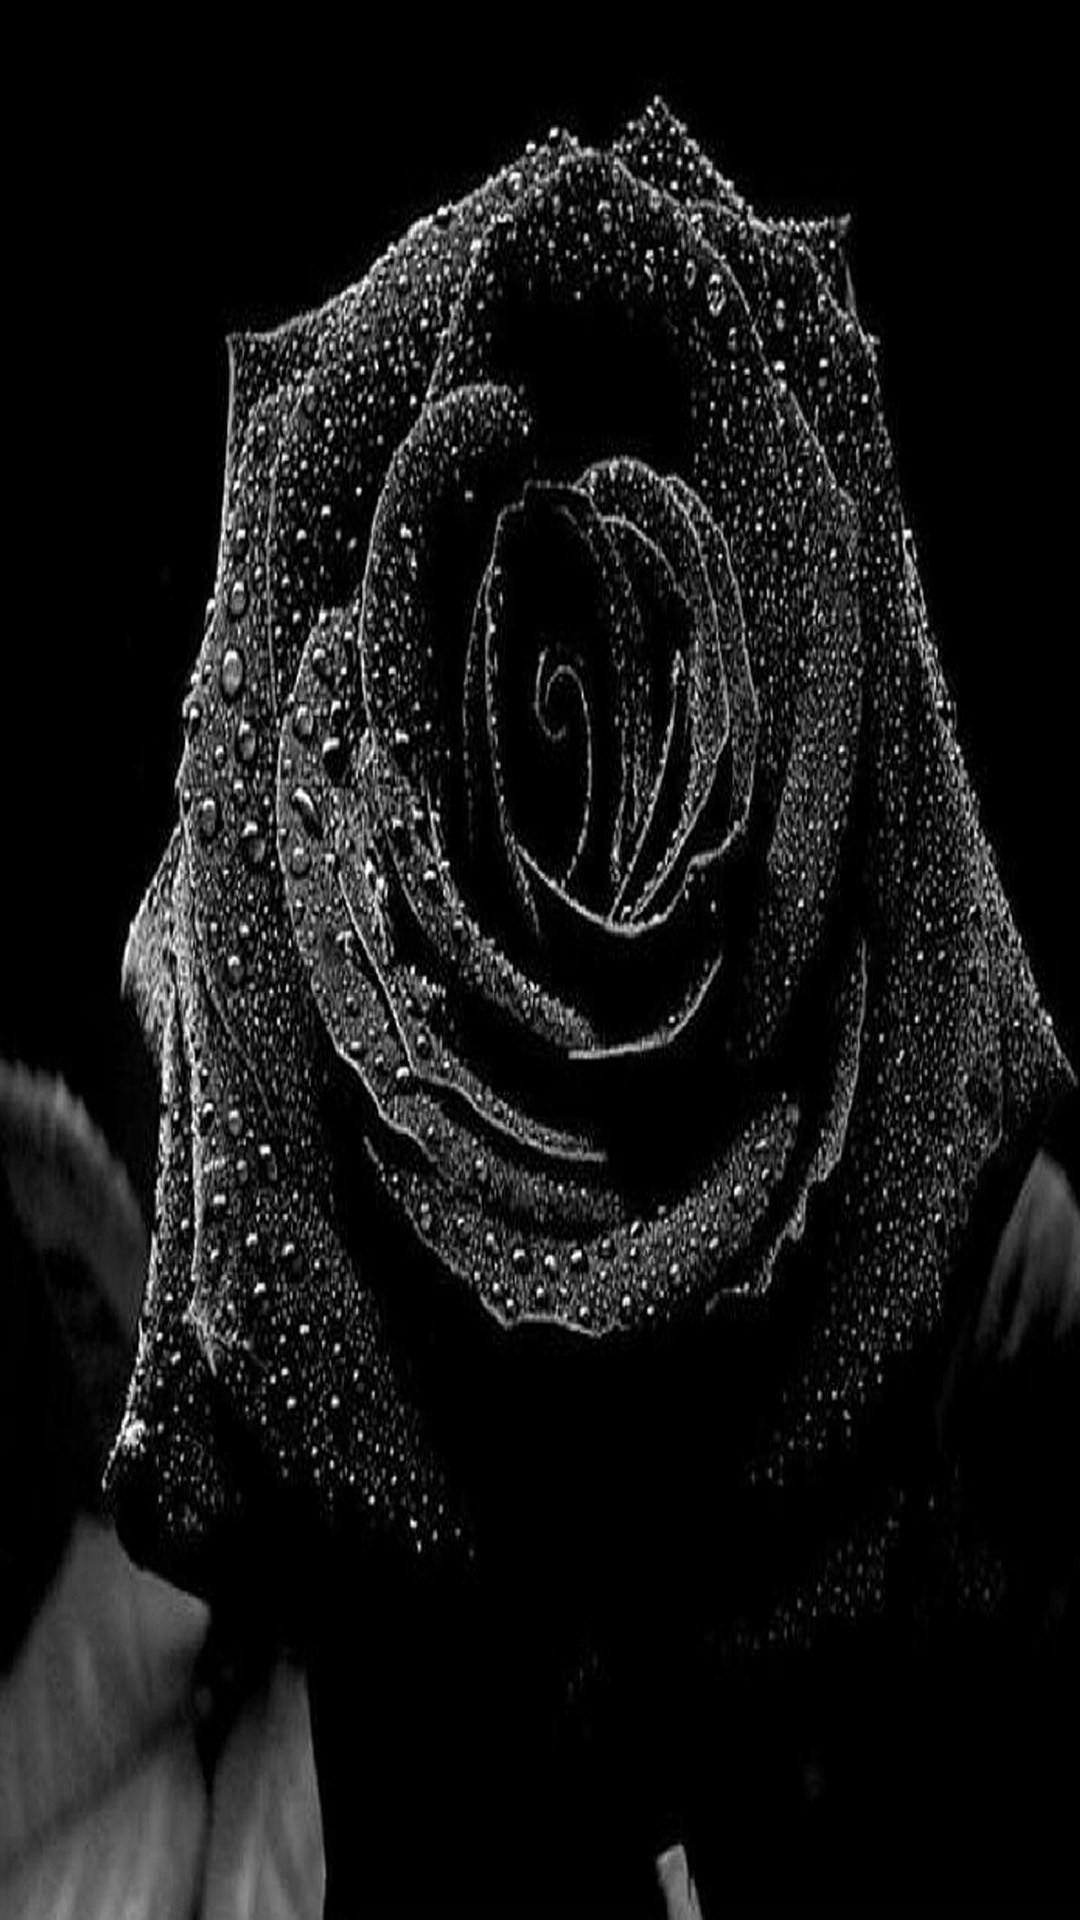 Black Roses Wallpaper 64 Images